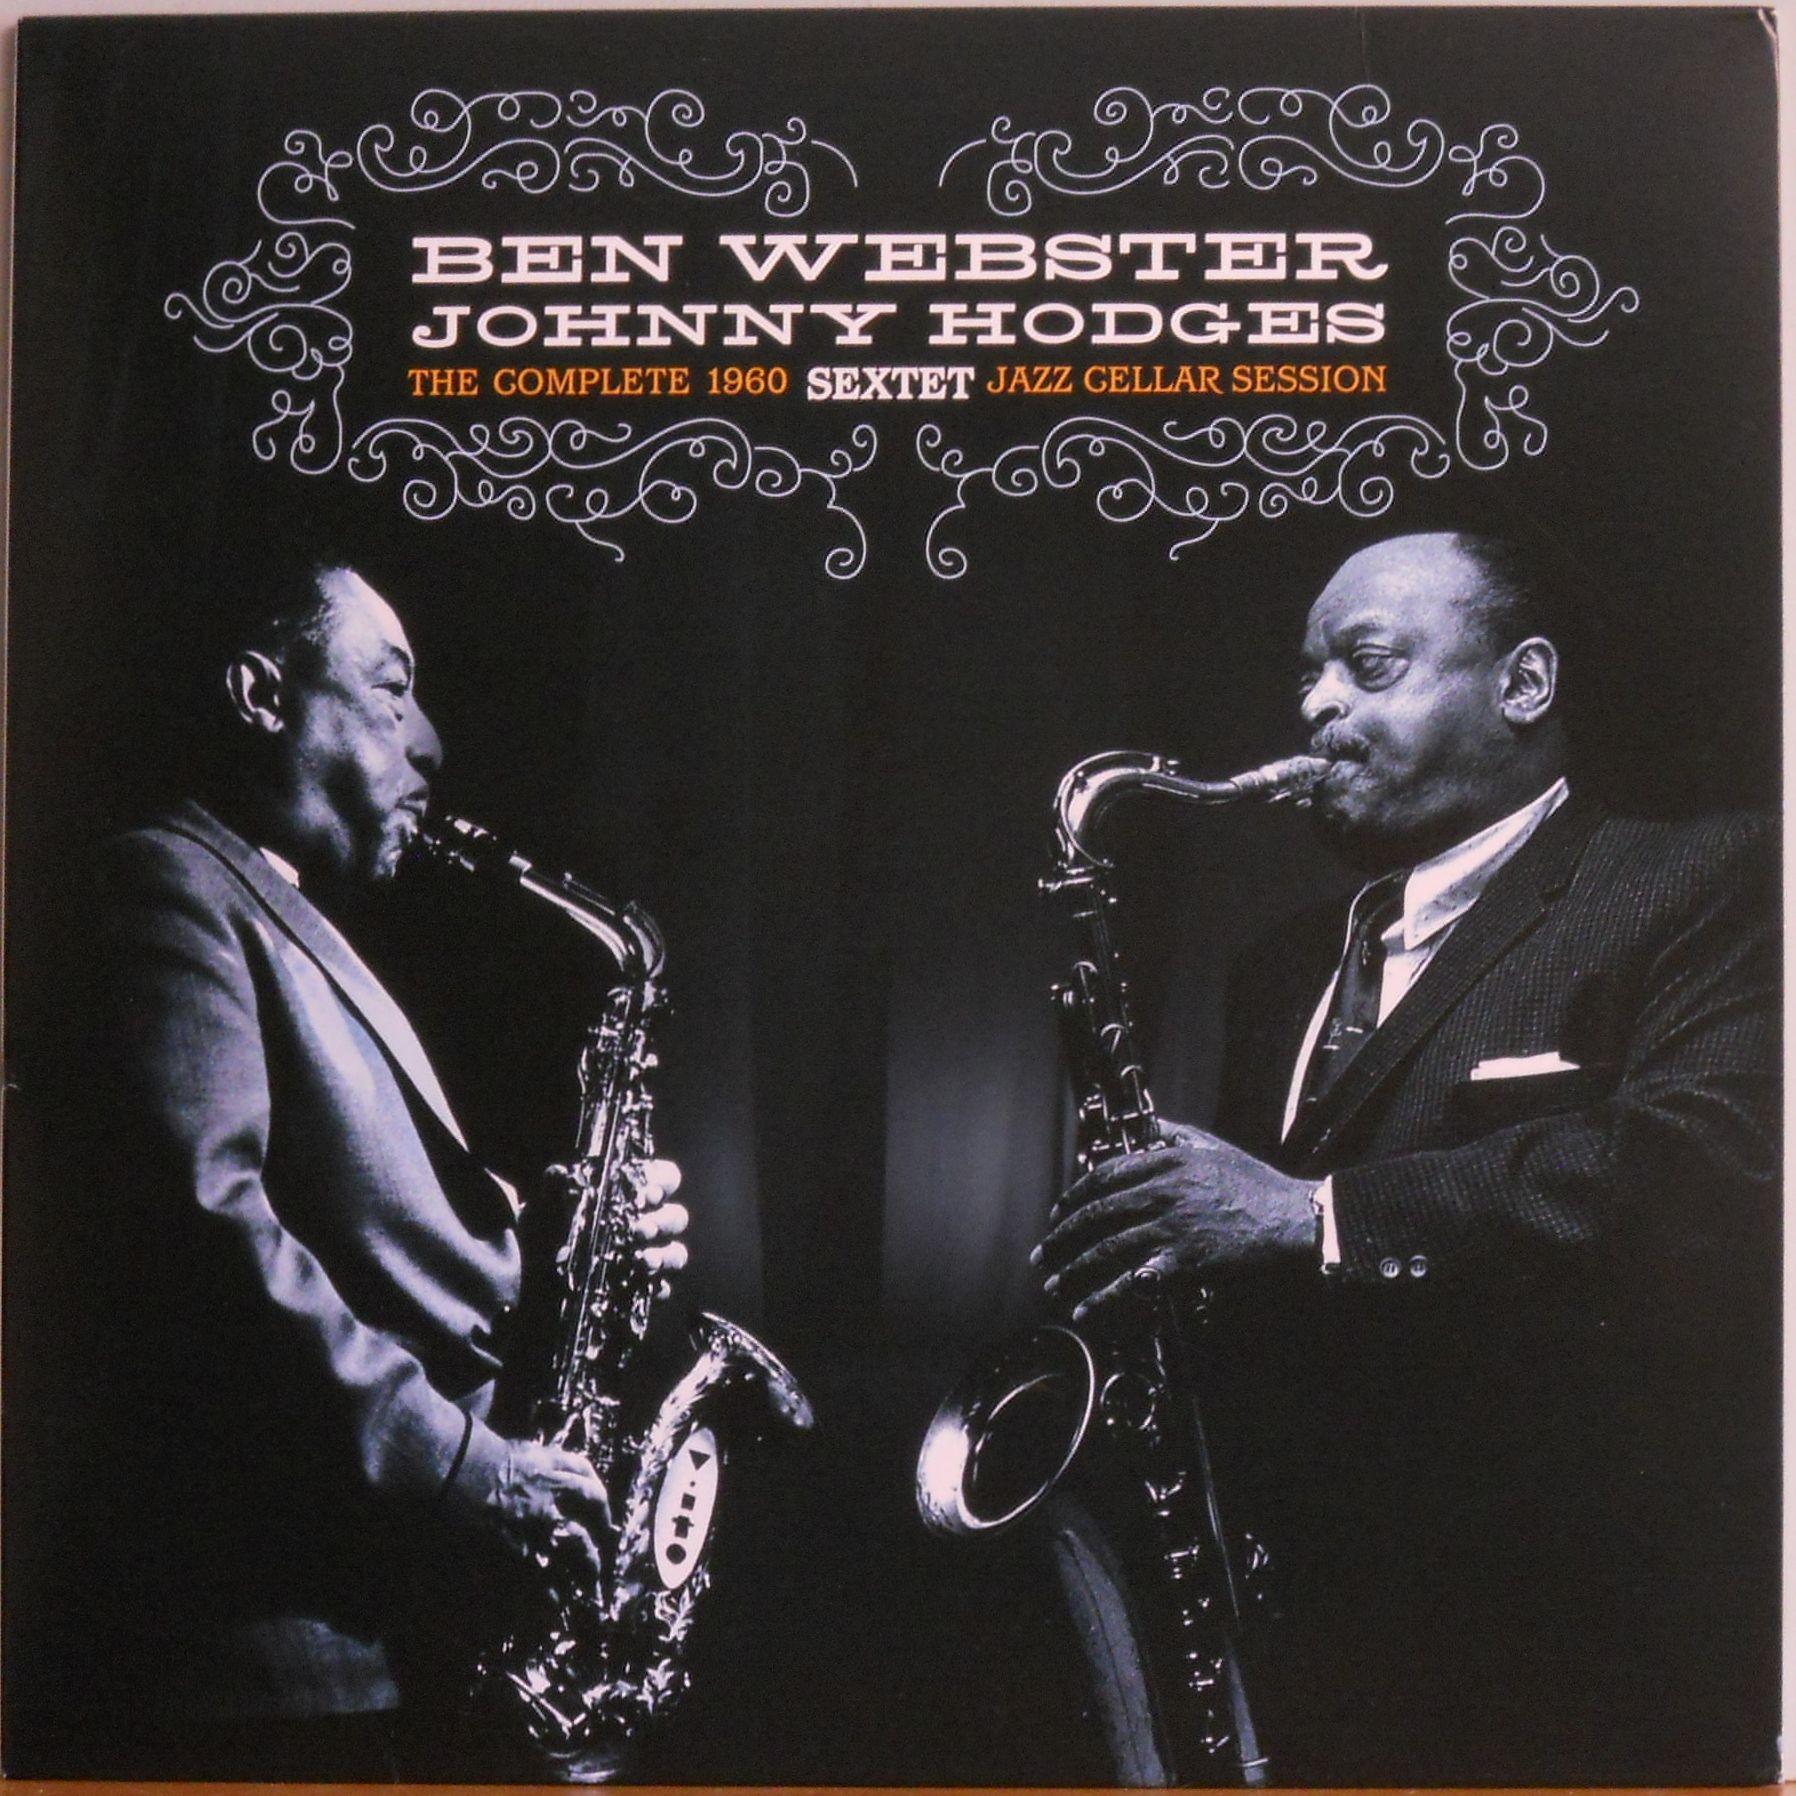 Johnny Hodges Ben Webster The Complete 1960 Sextet Jazz Cellar Session Lp Vinyl Jazz Johnny Hodges